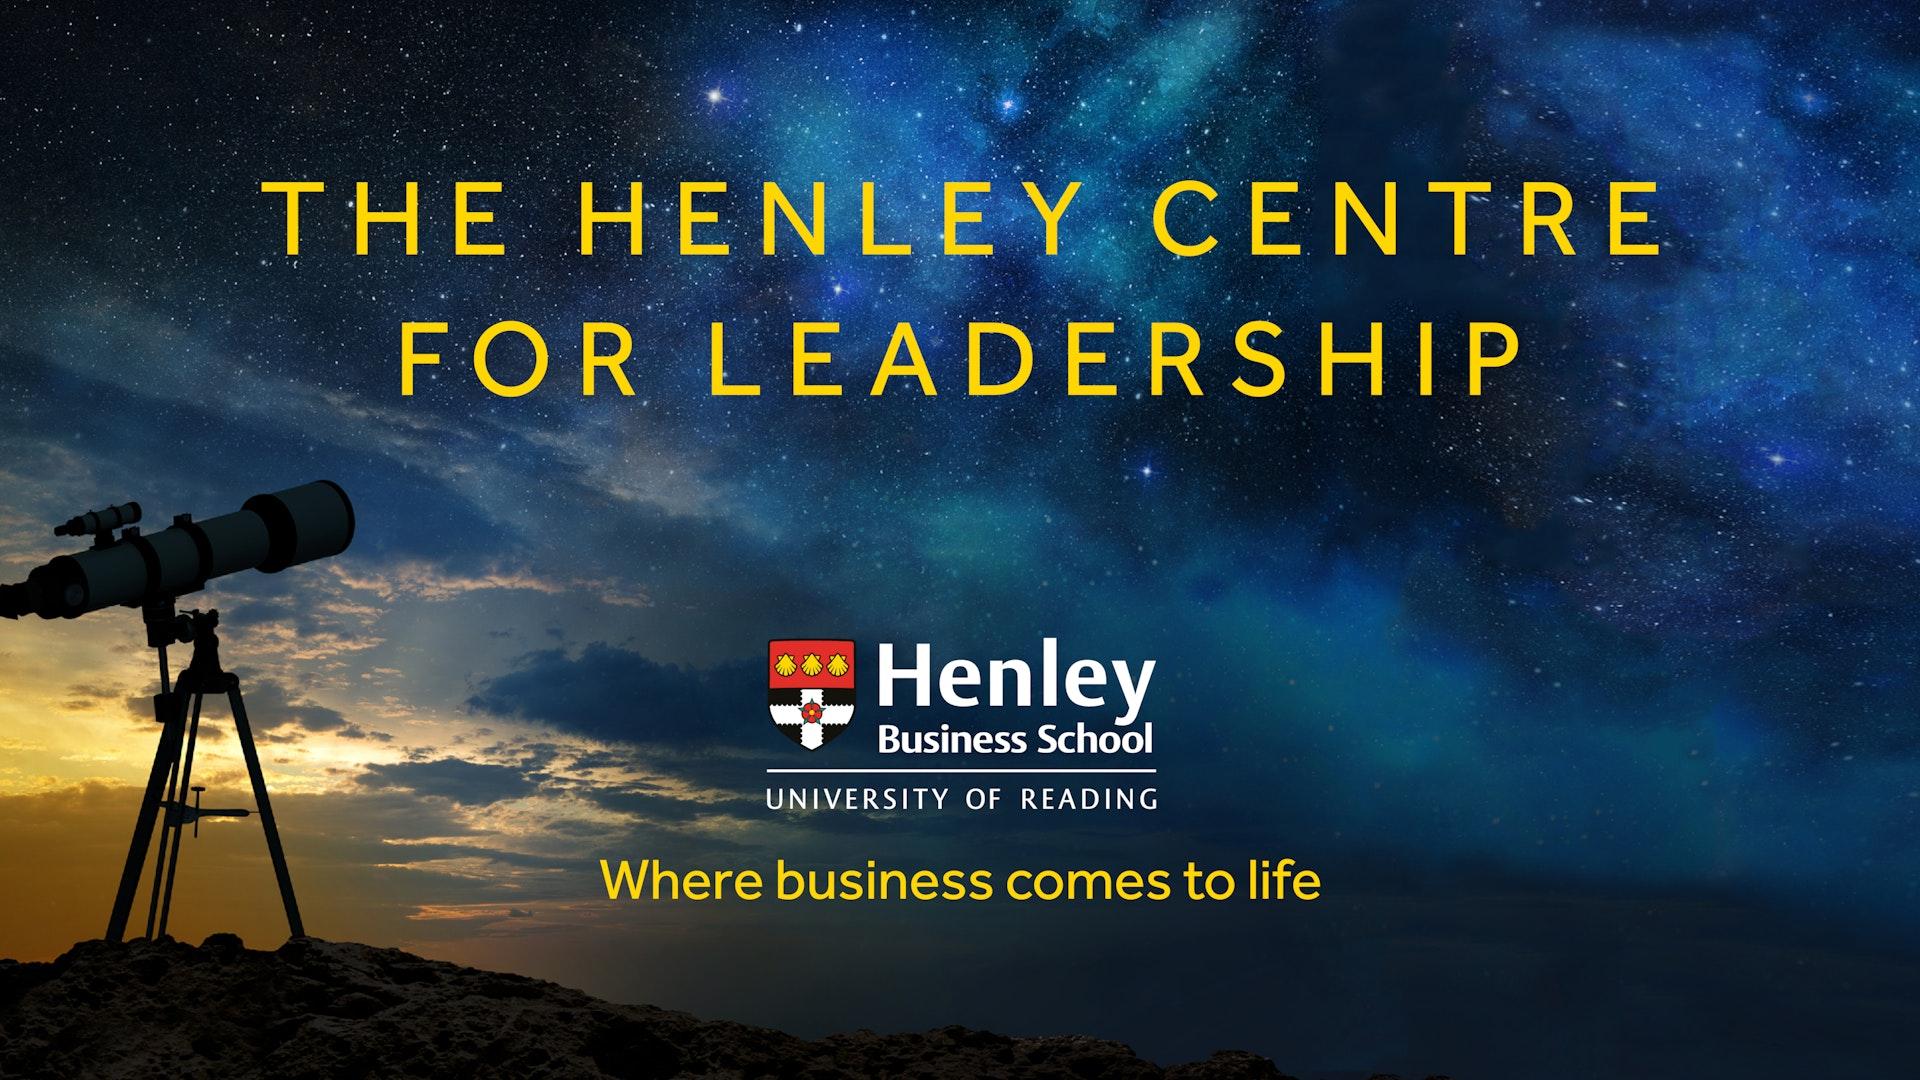 HCL web image